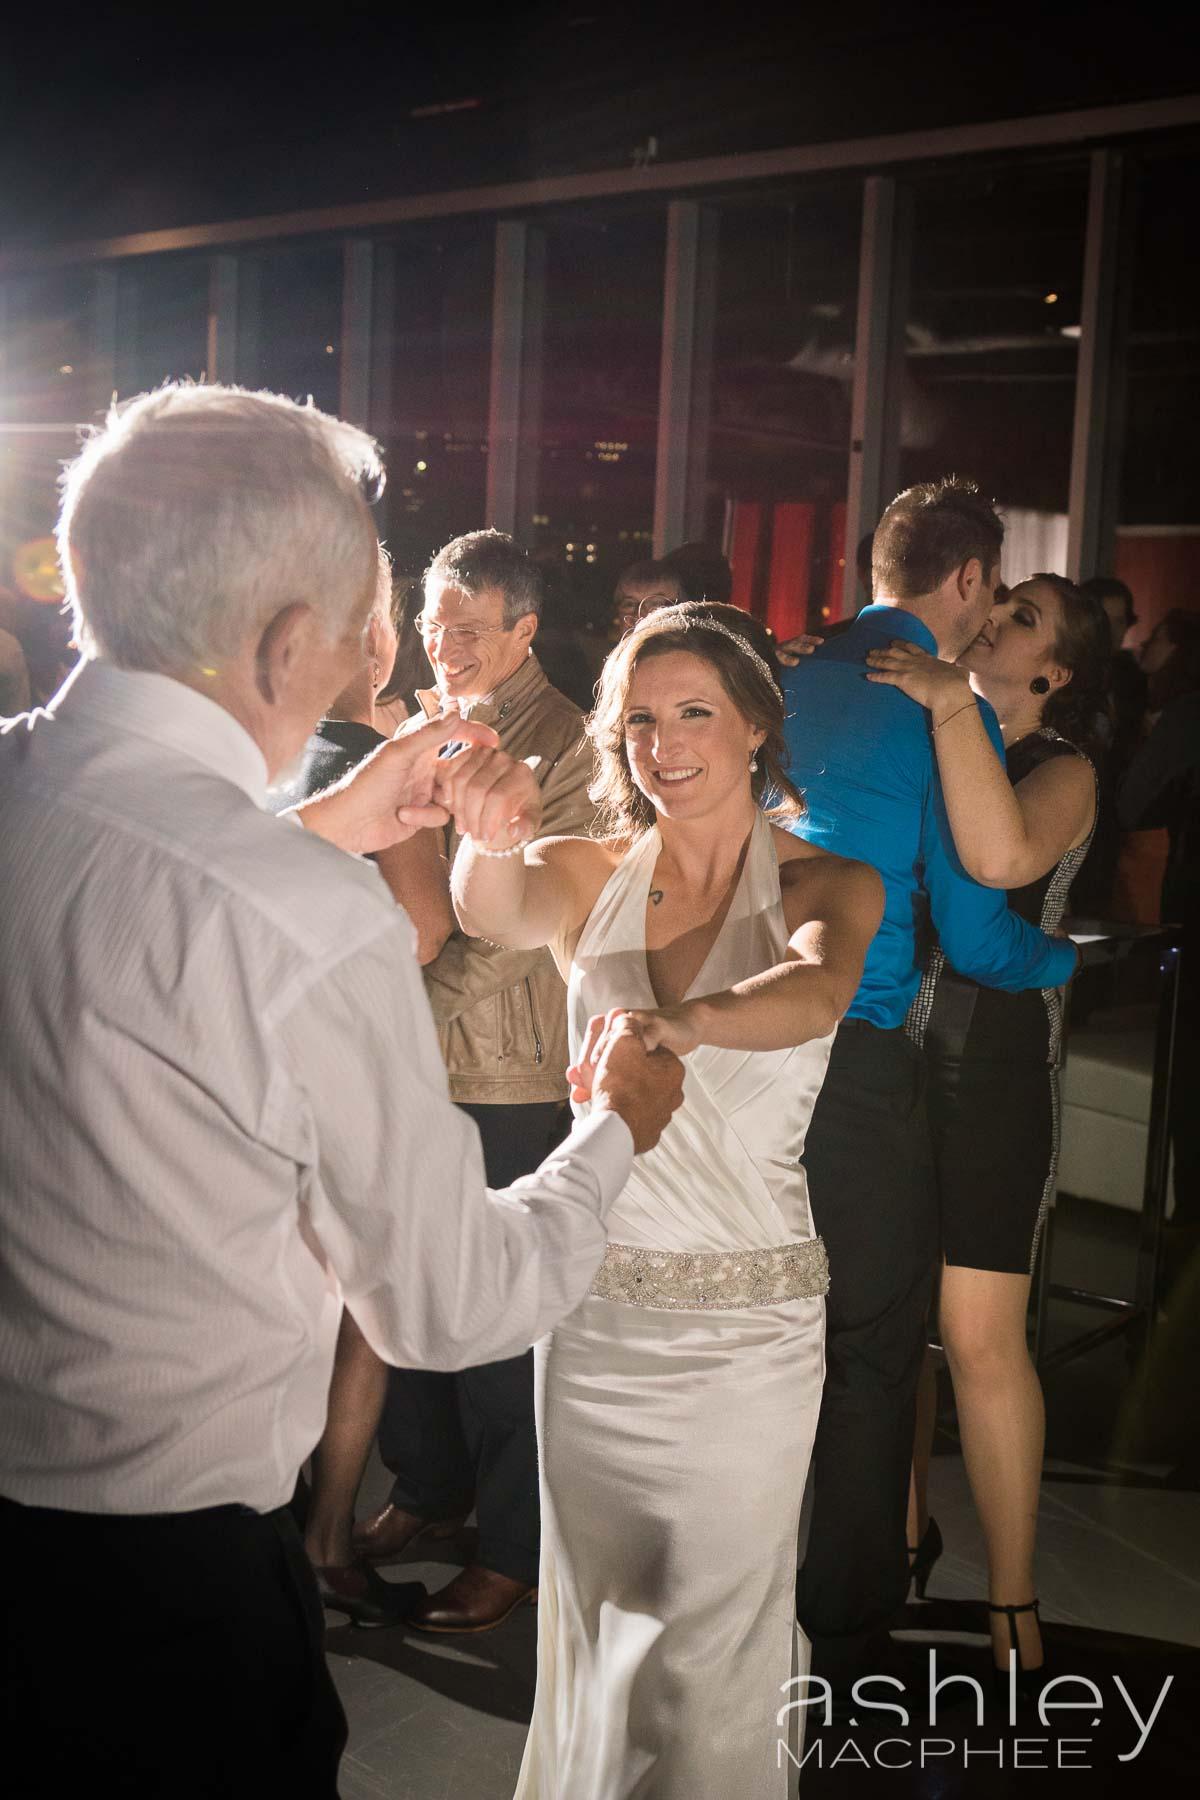 Ashley MacPhee Photography Science CEnter Wedding Photos (7 of 8).jpg